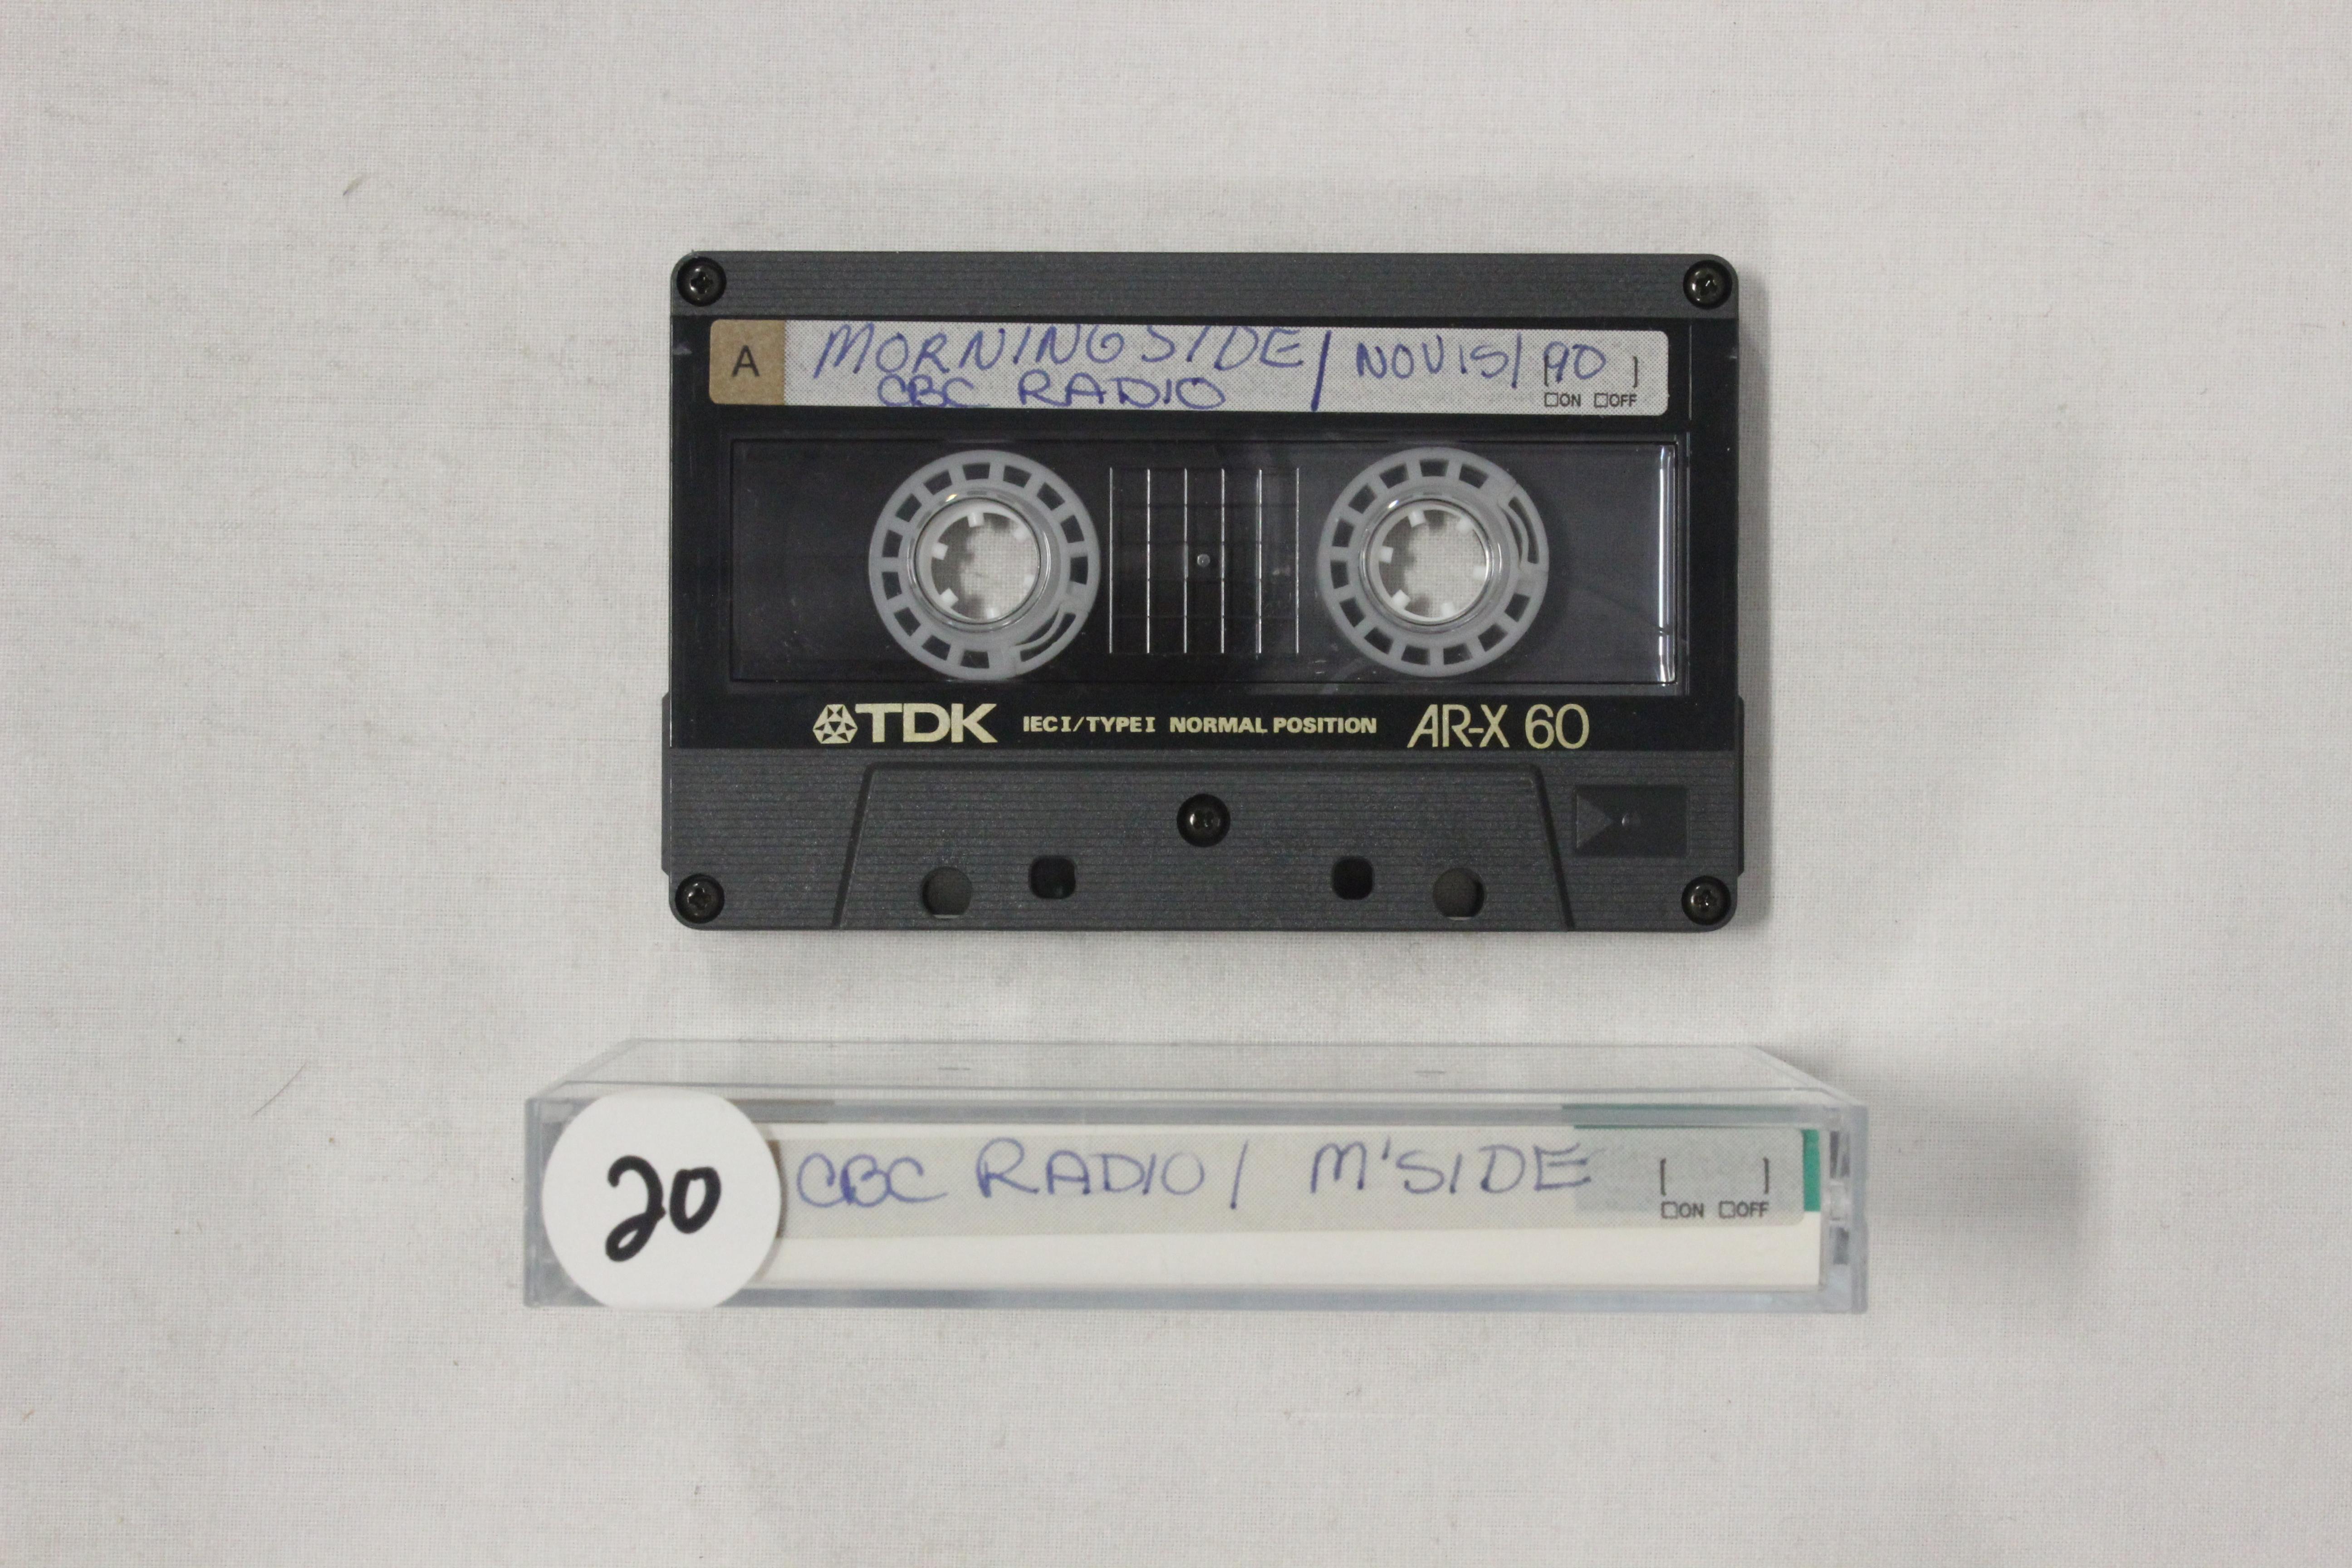 CBC radio,Morningside, 15 Nov 1990